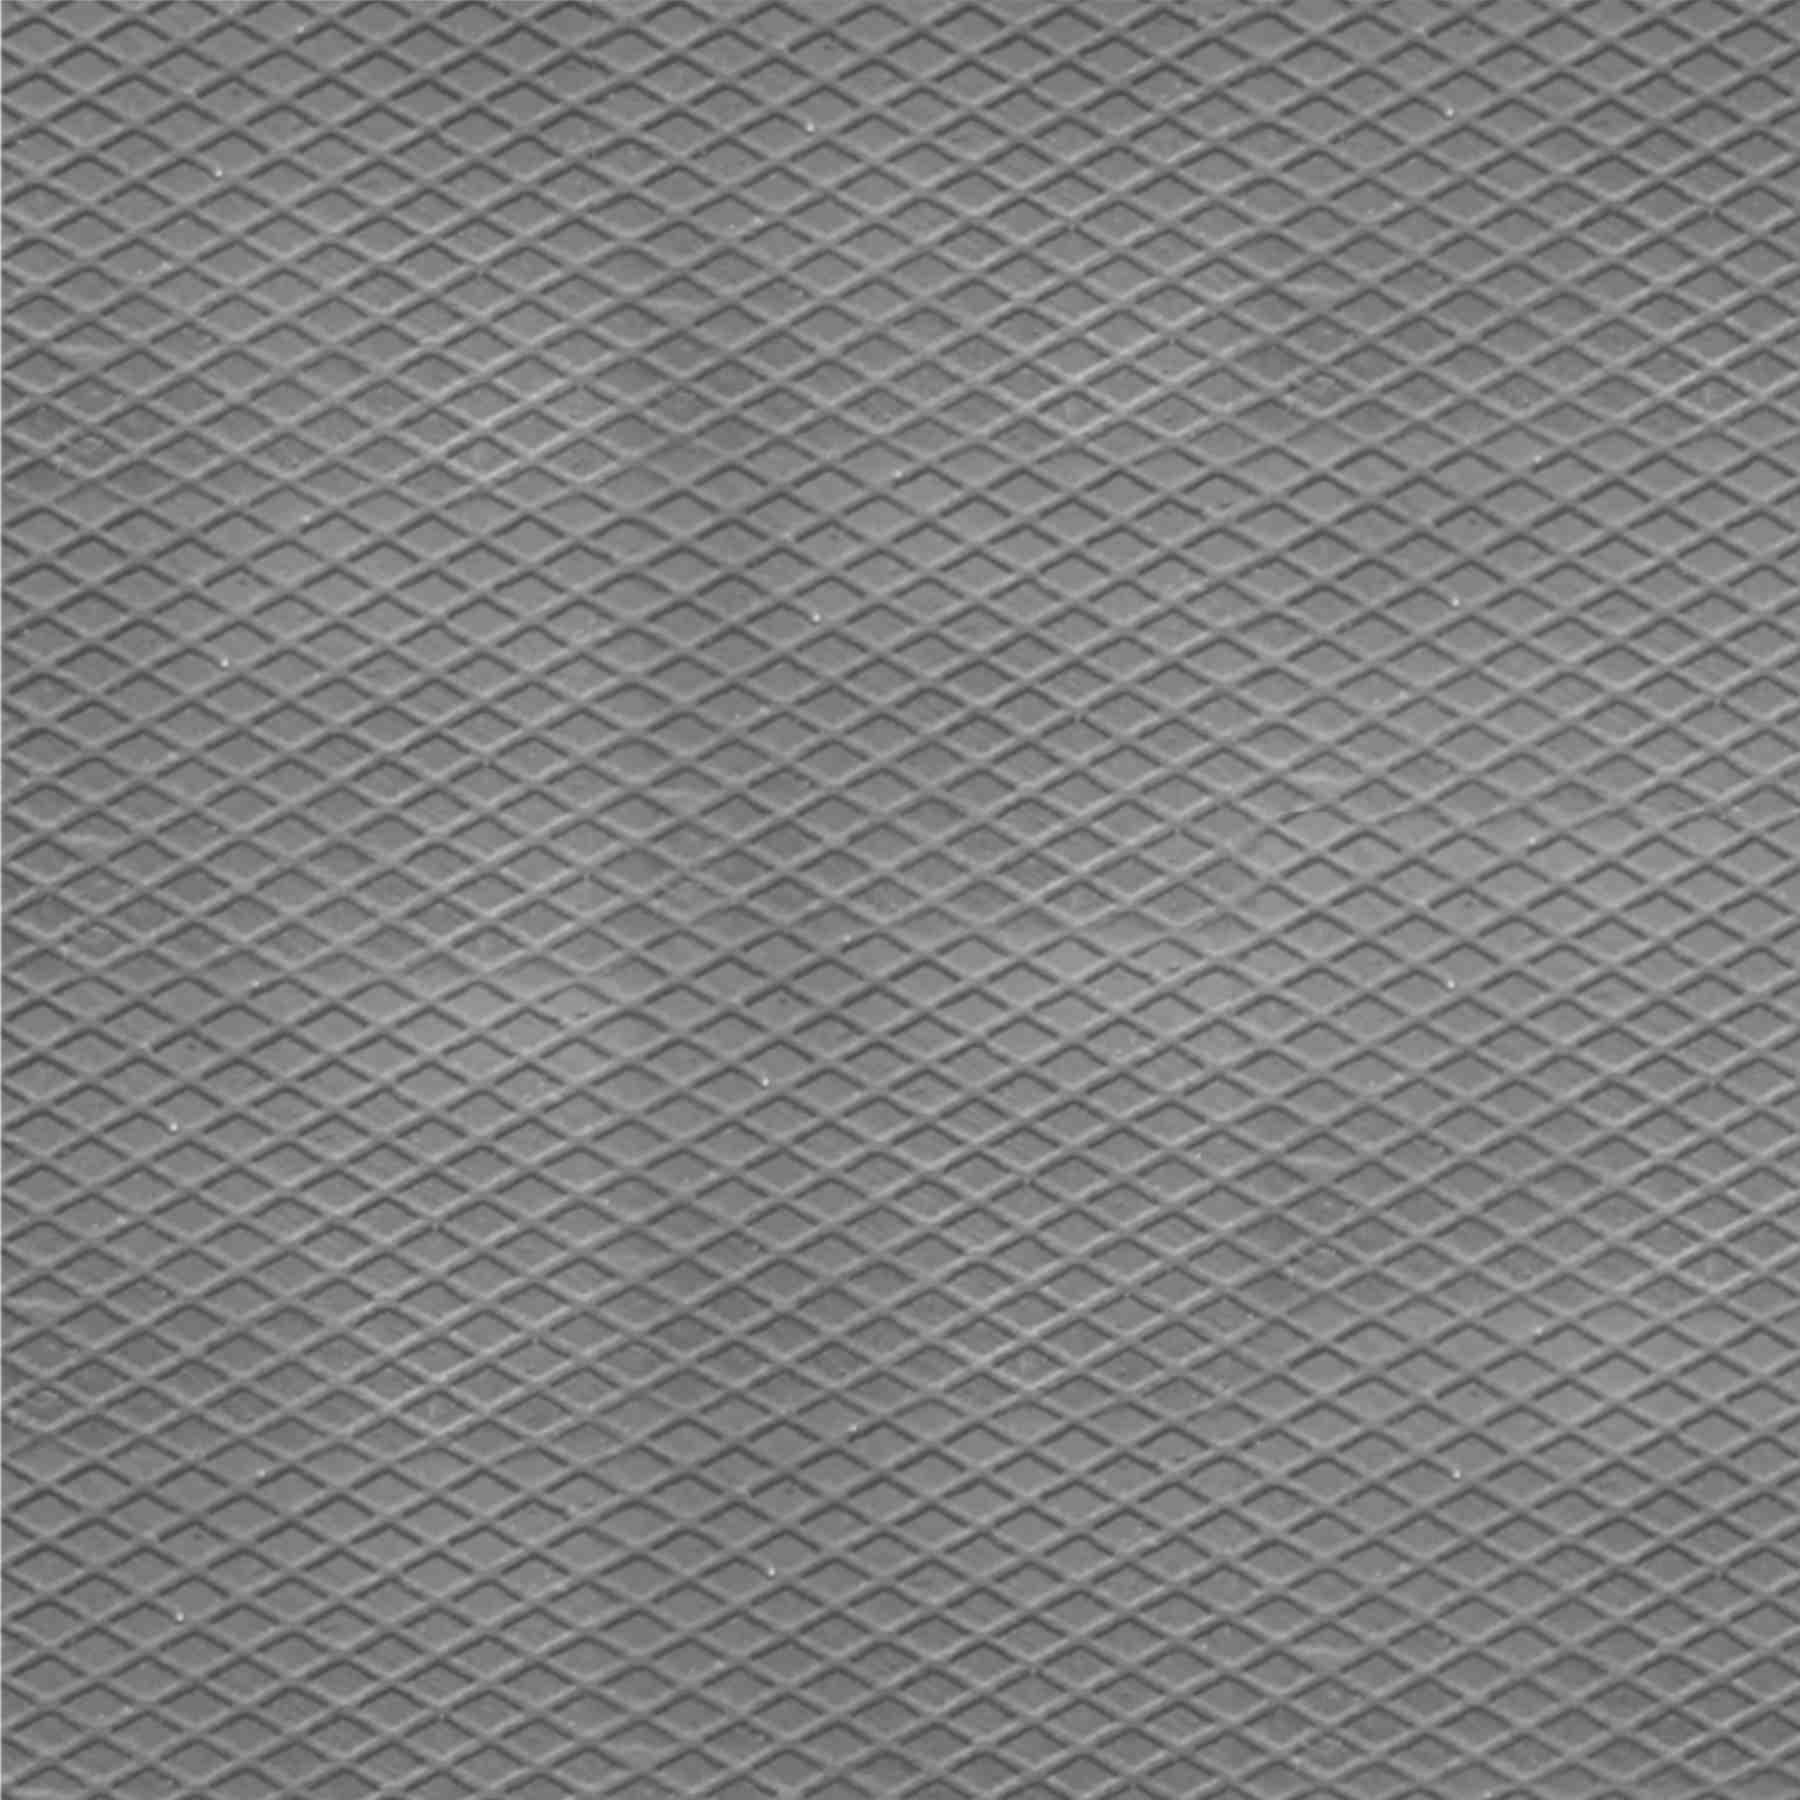 Diamond wire frame.jpeg